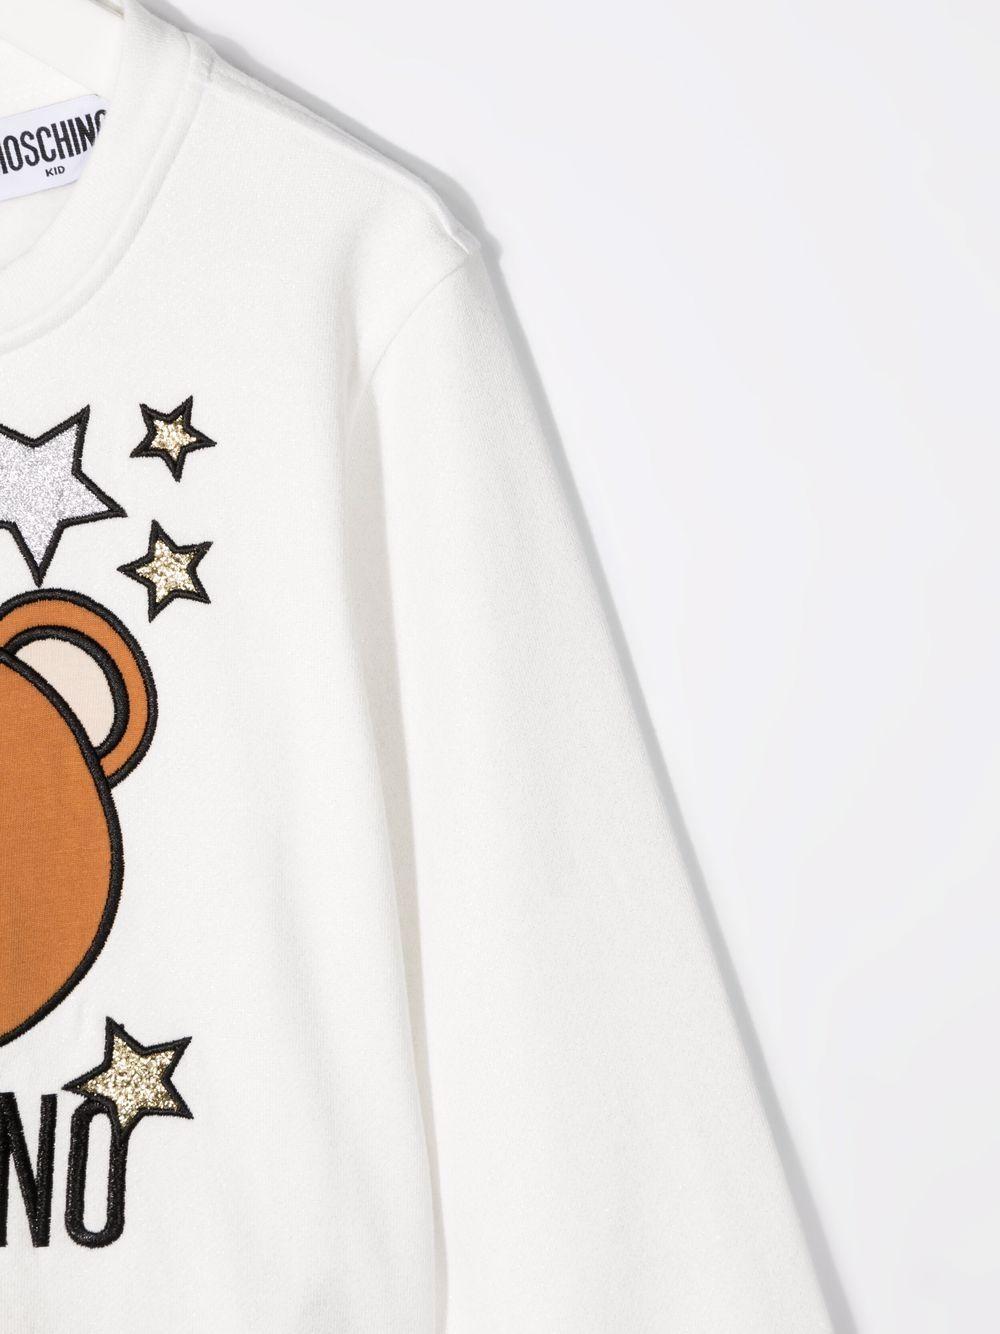 moschino felpa con stampa orso e stelle MOSCHINO KIDS | Felpa | HDF03CLCA2510063